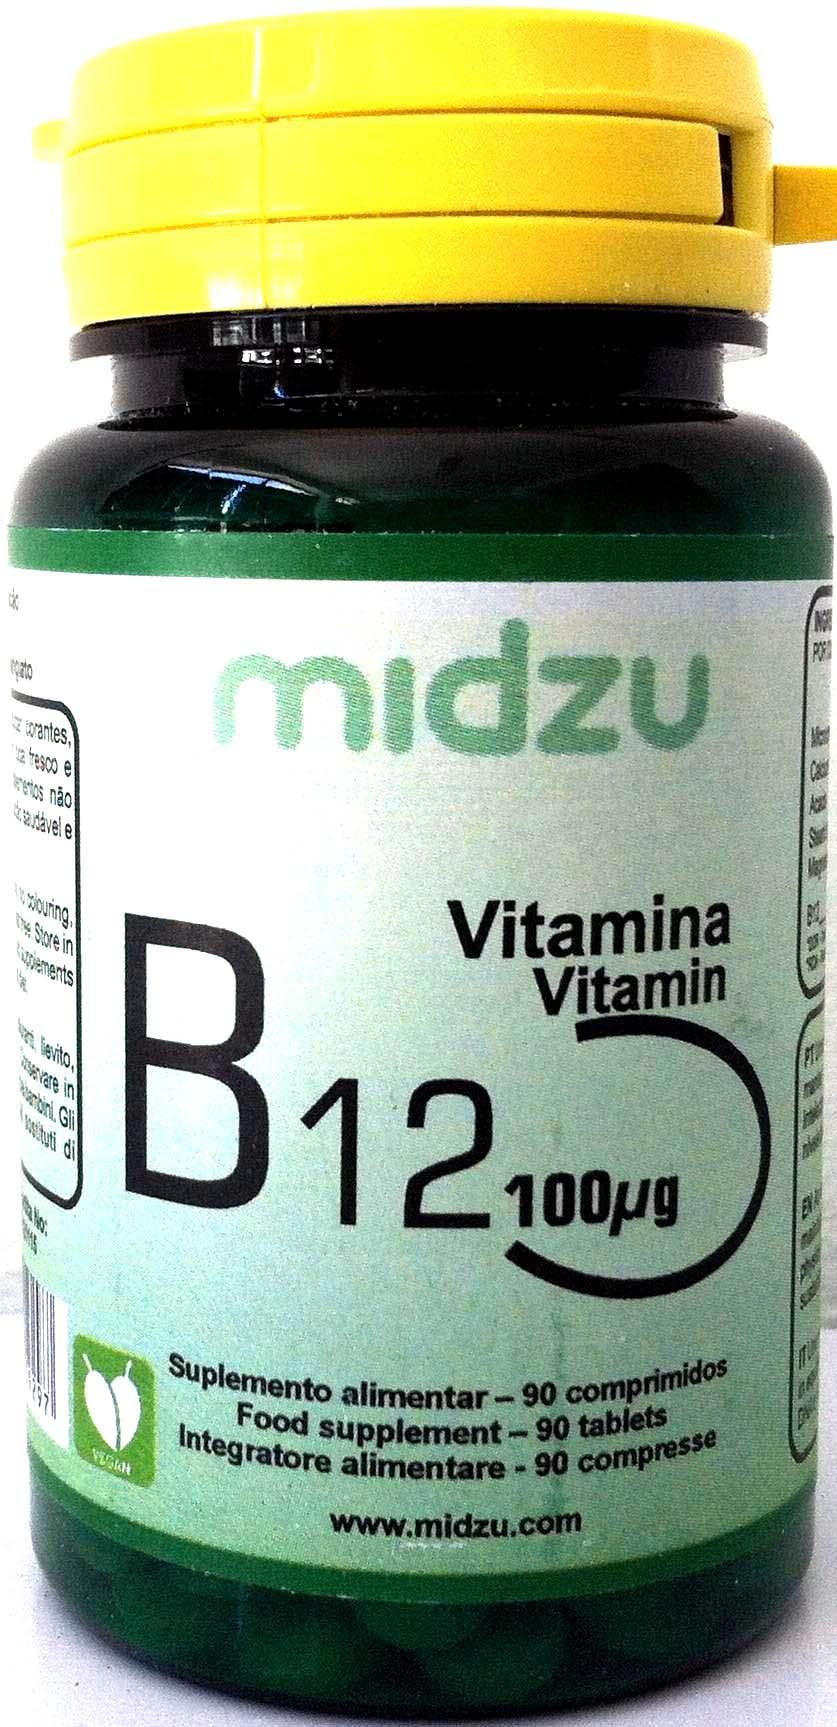 Vitamina B12 Midzu (100ug)